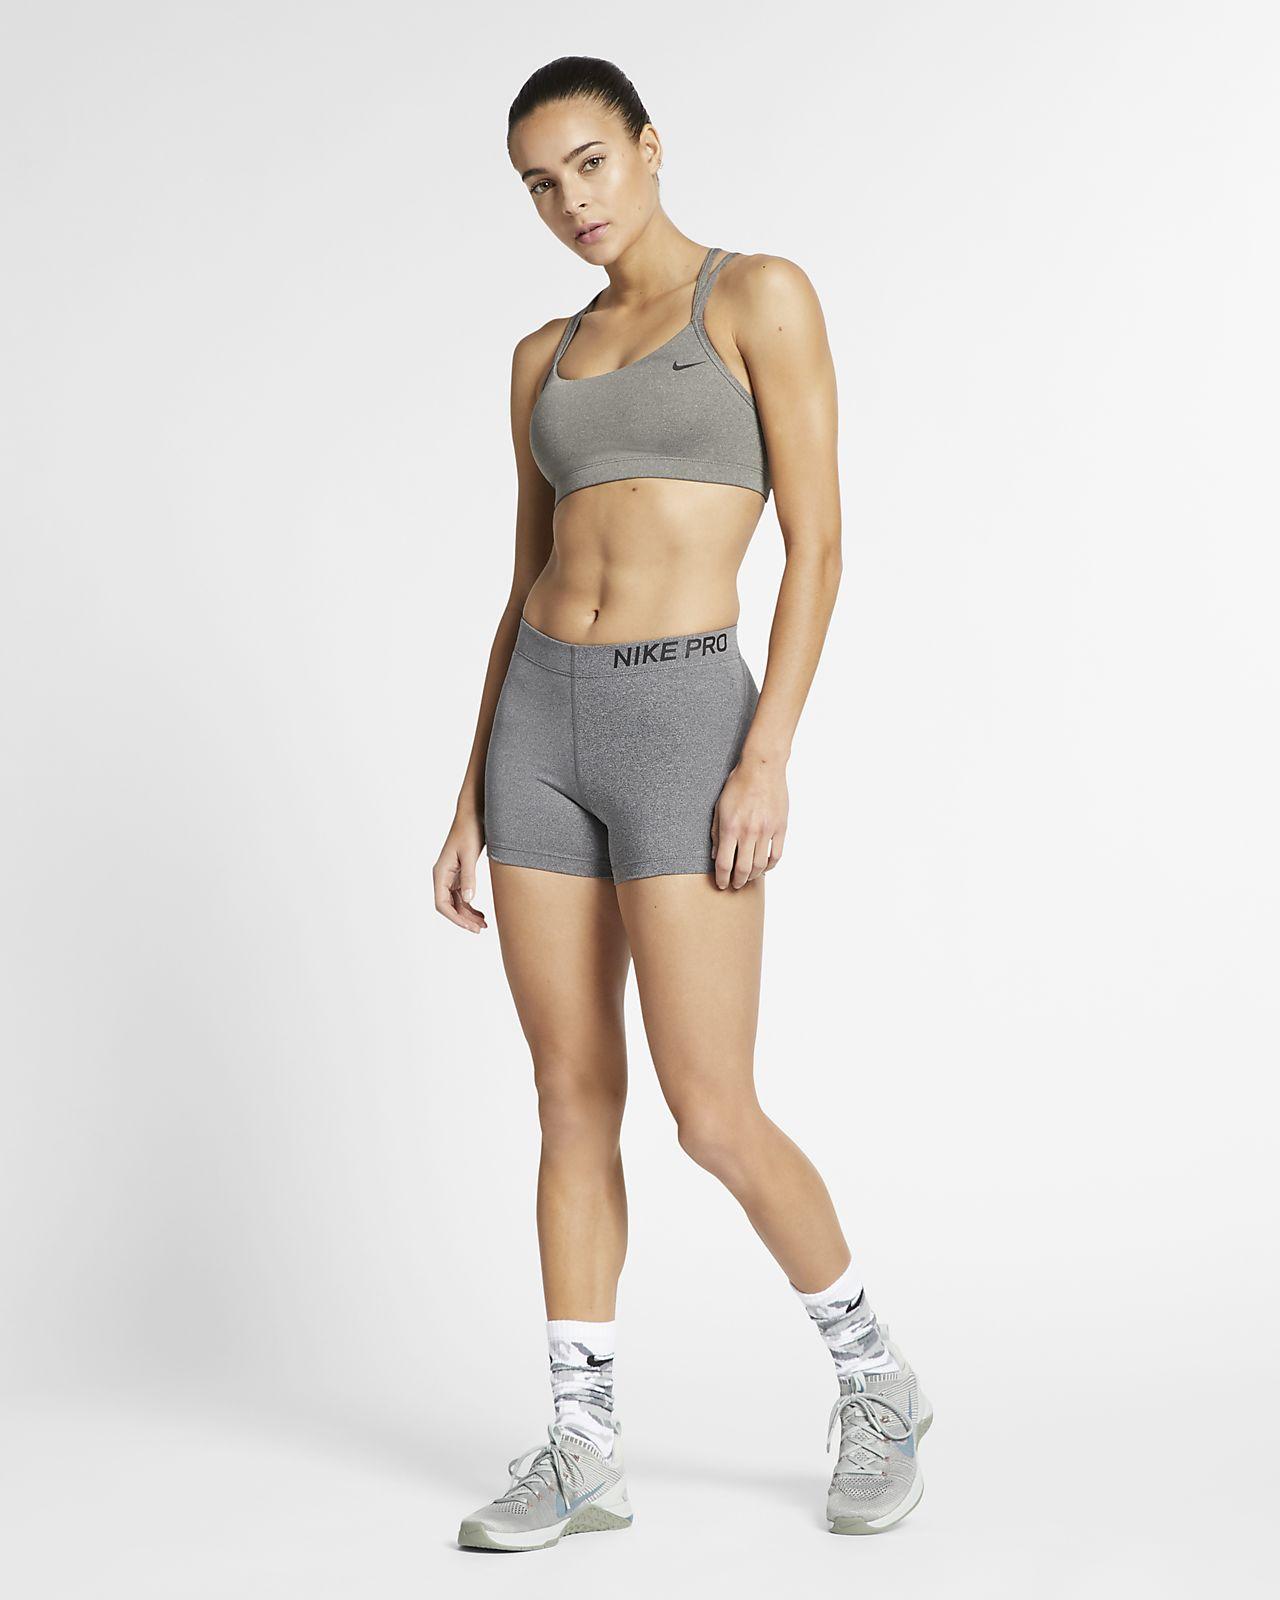 nike shorts jd sports